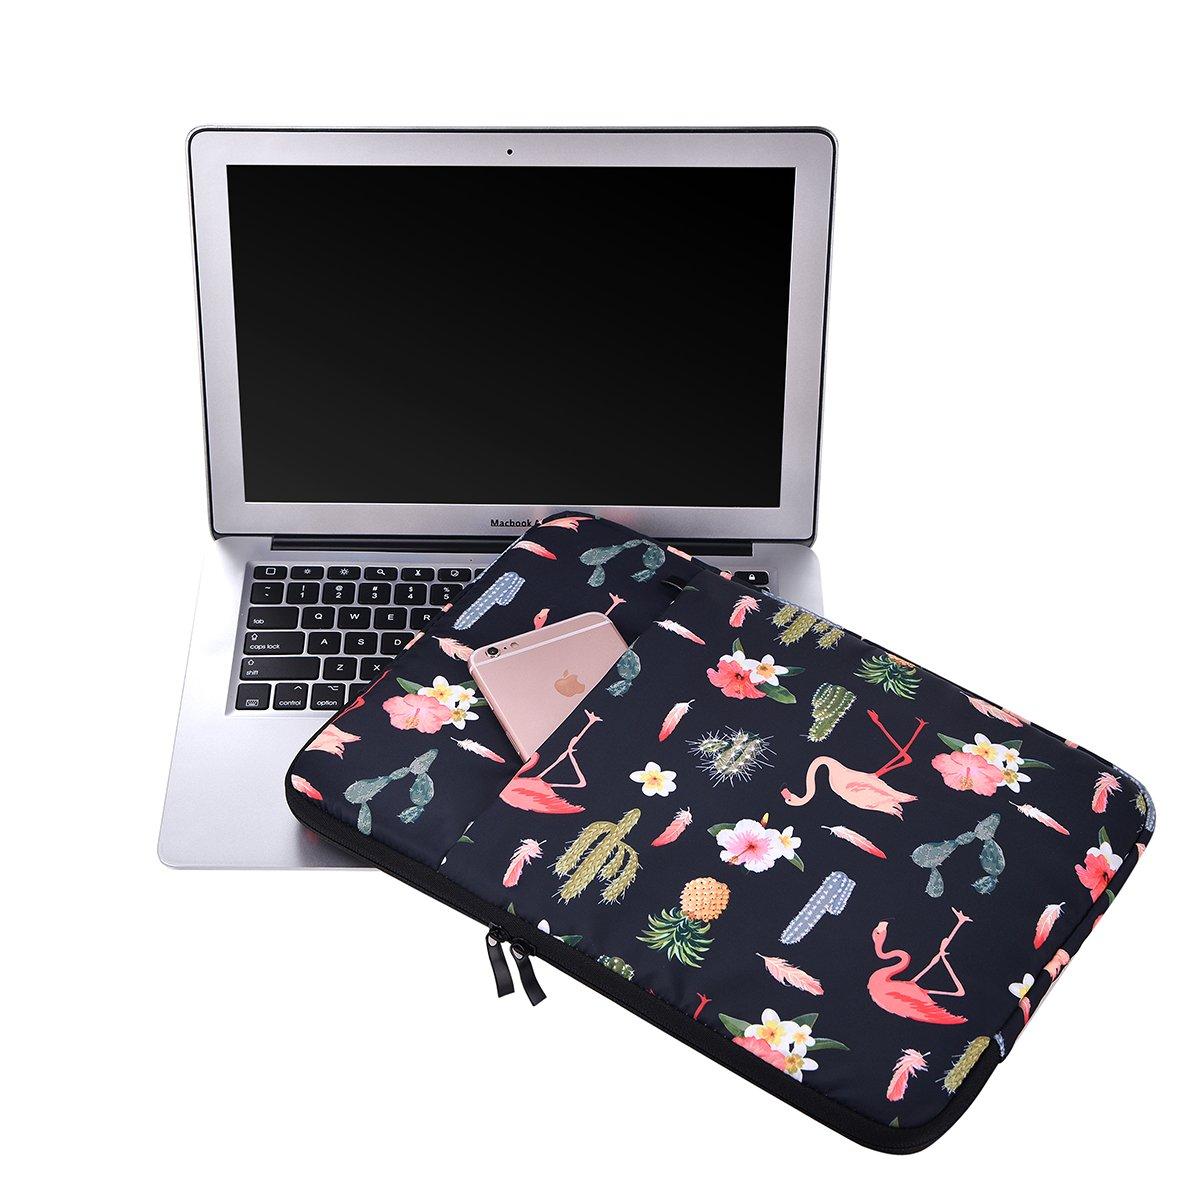 Lamyba - Funda para portátil de 13 a 15,6 Pulgadas Flamingo-Black 15,6 Pulgadas